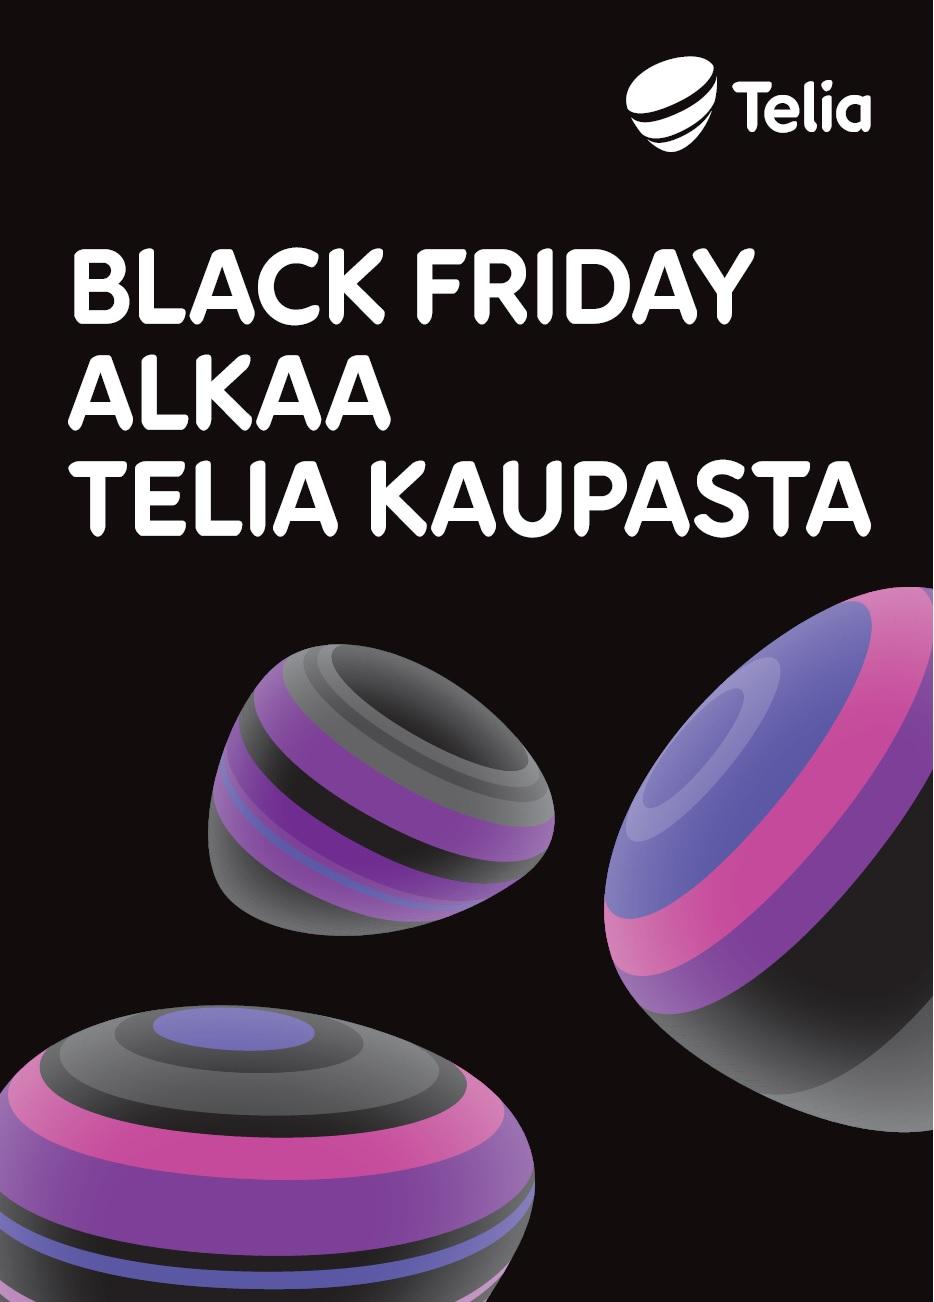 telia black friday